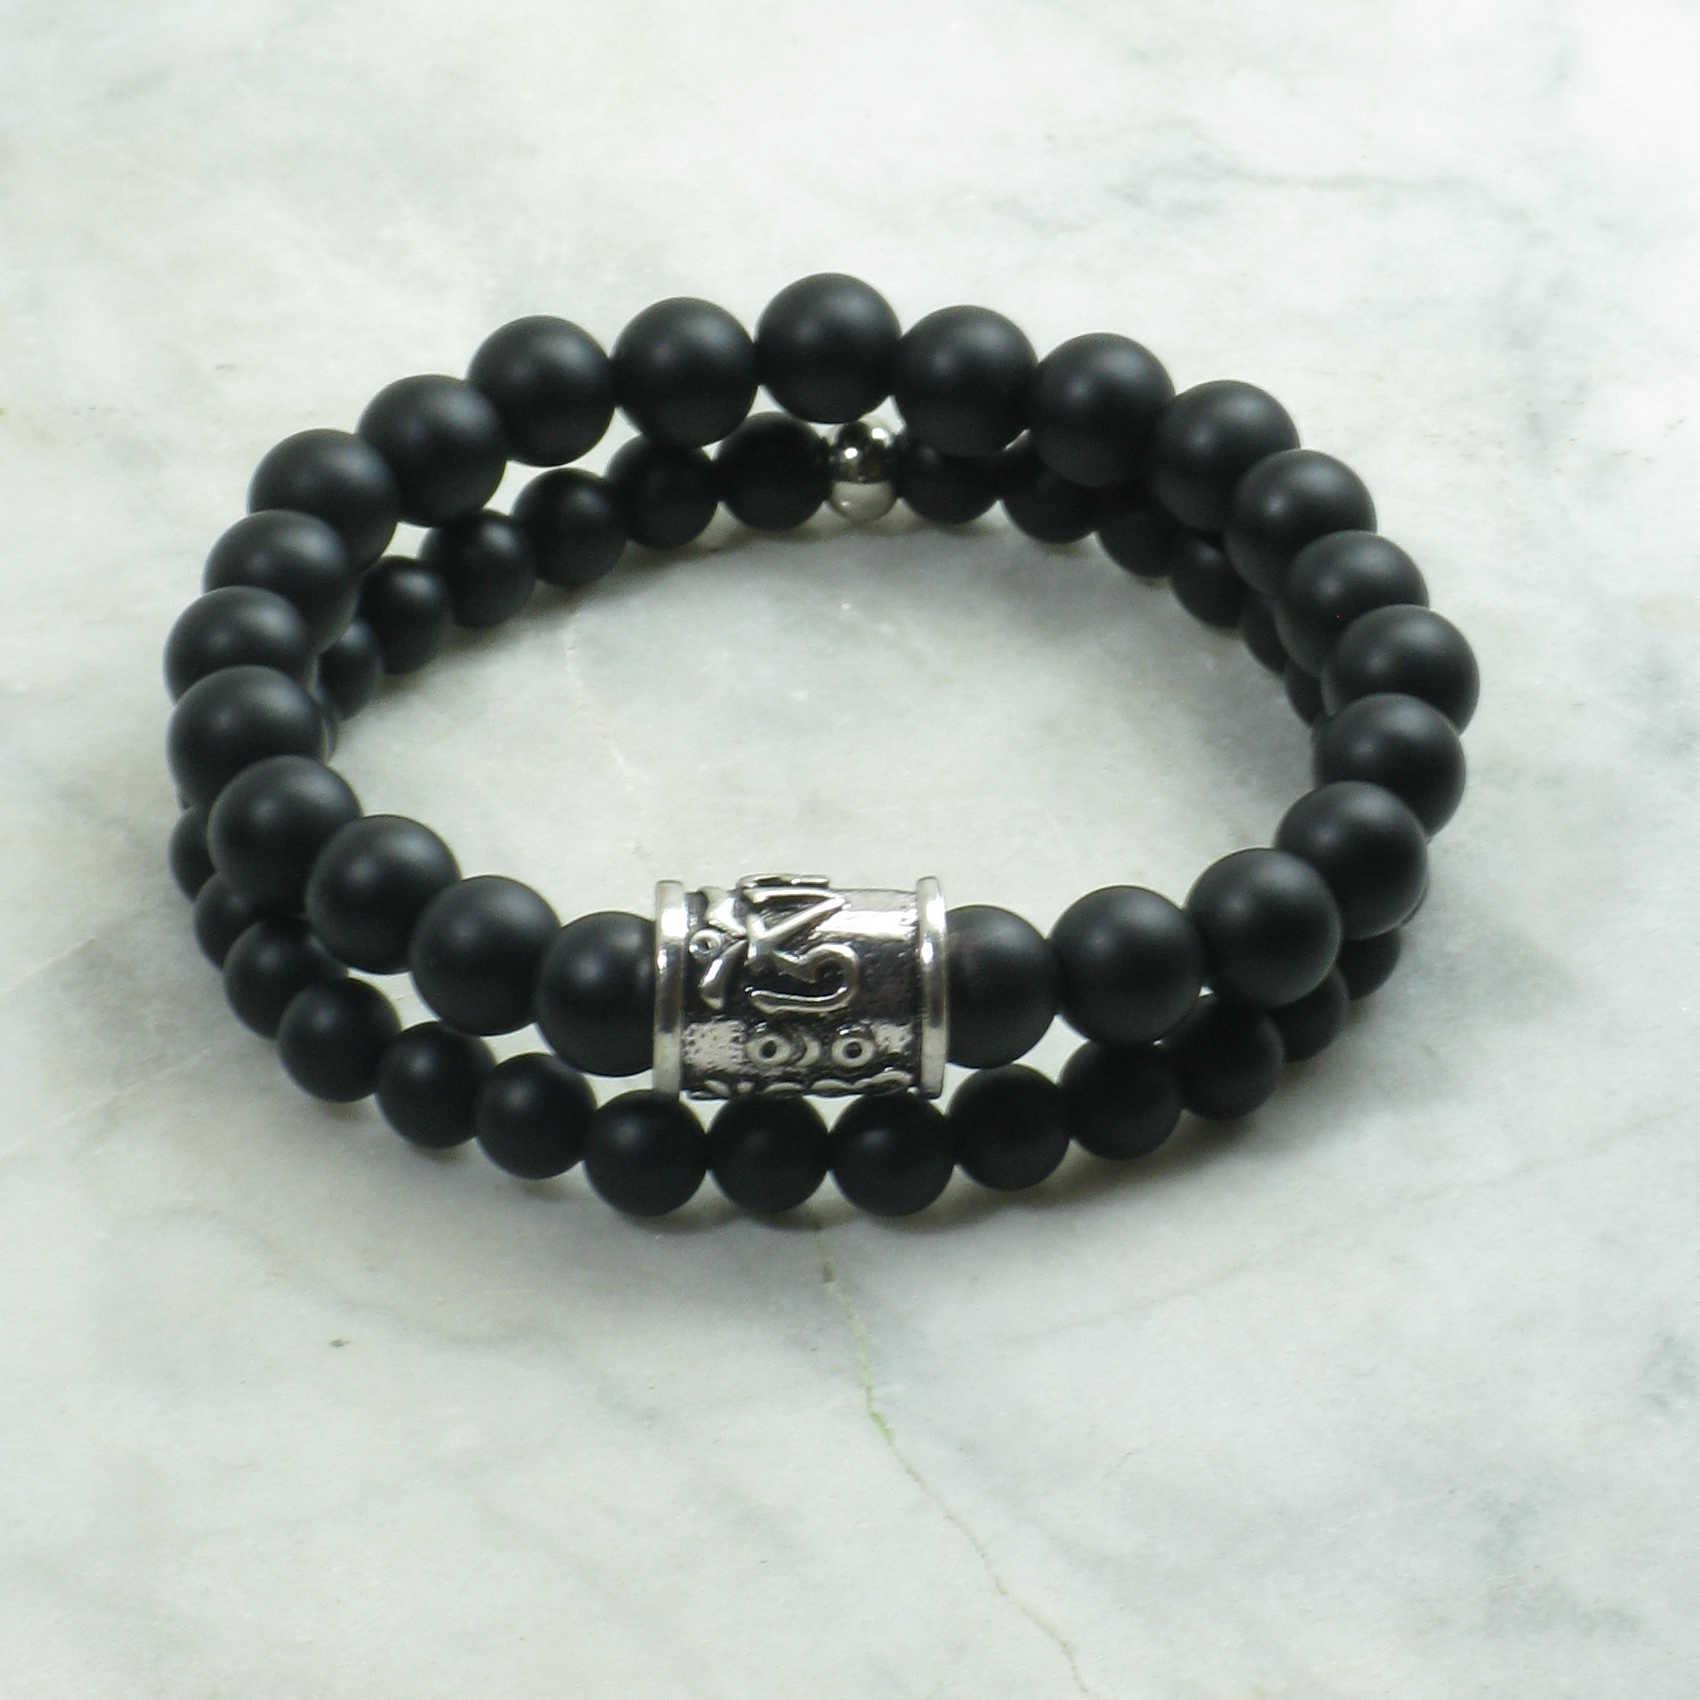 nichiren bracelets for black agate mala mala